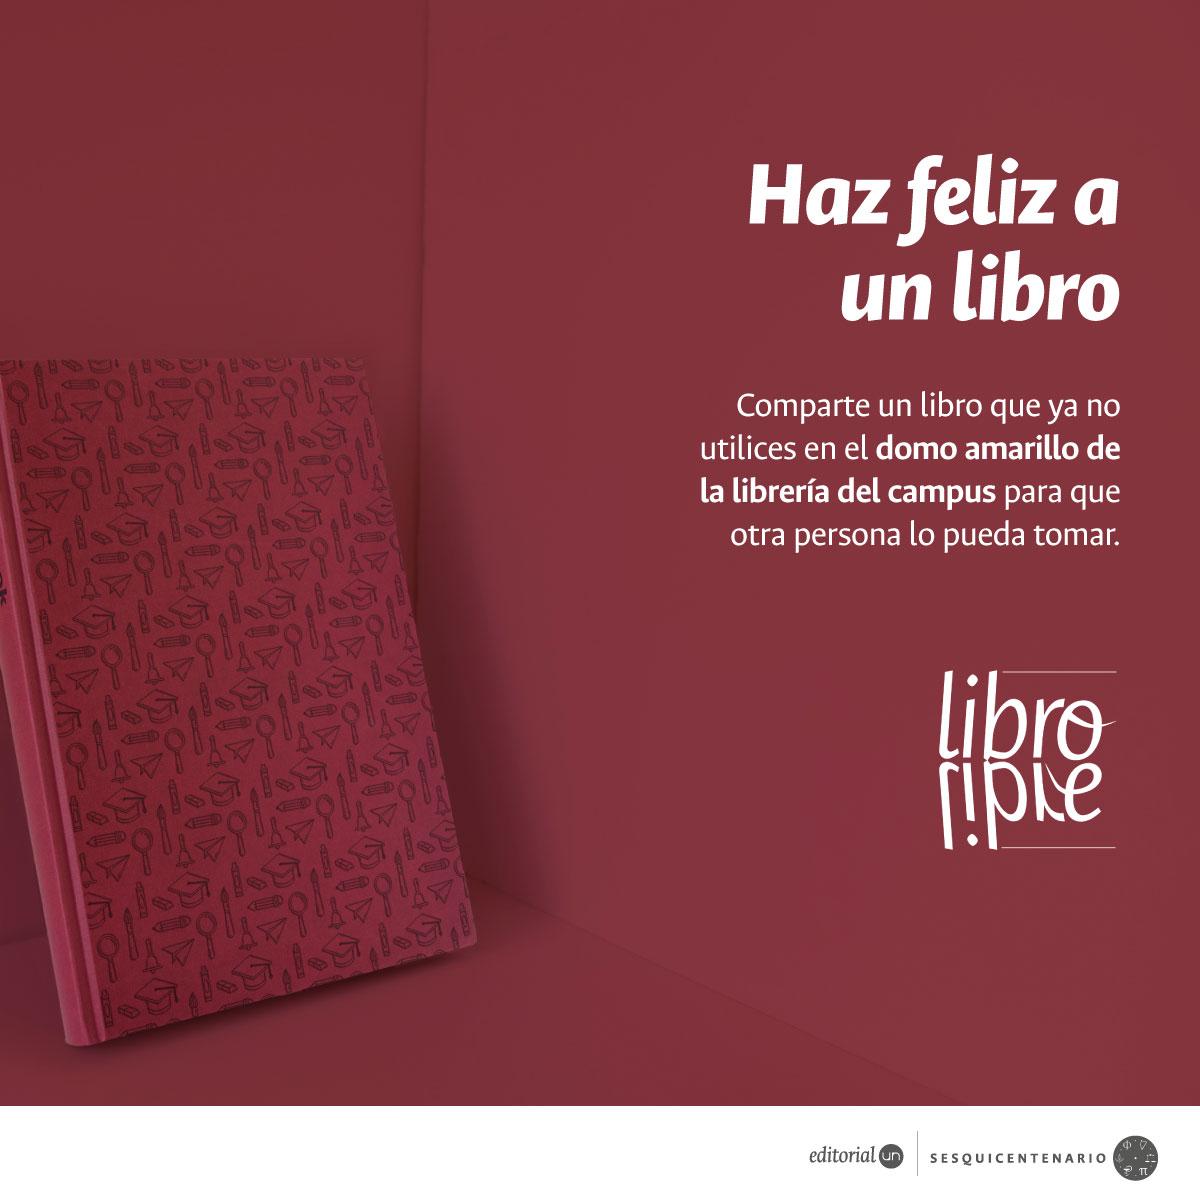 #LibroLibre